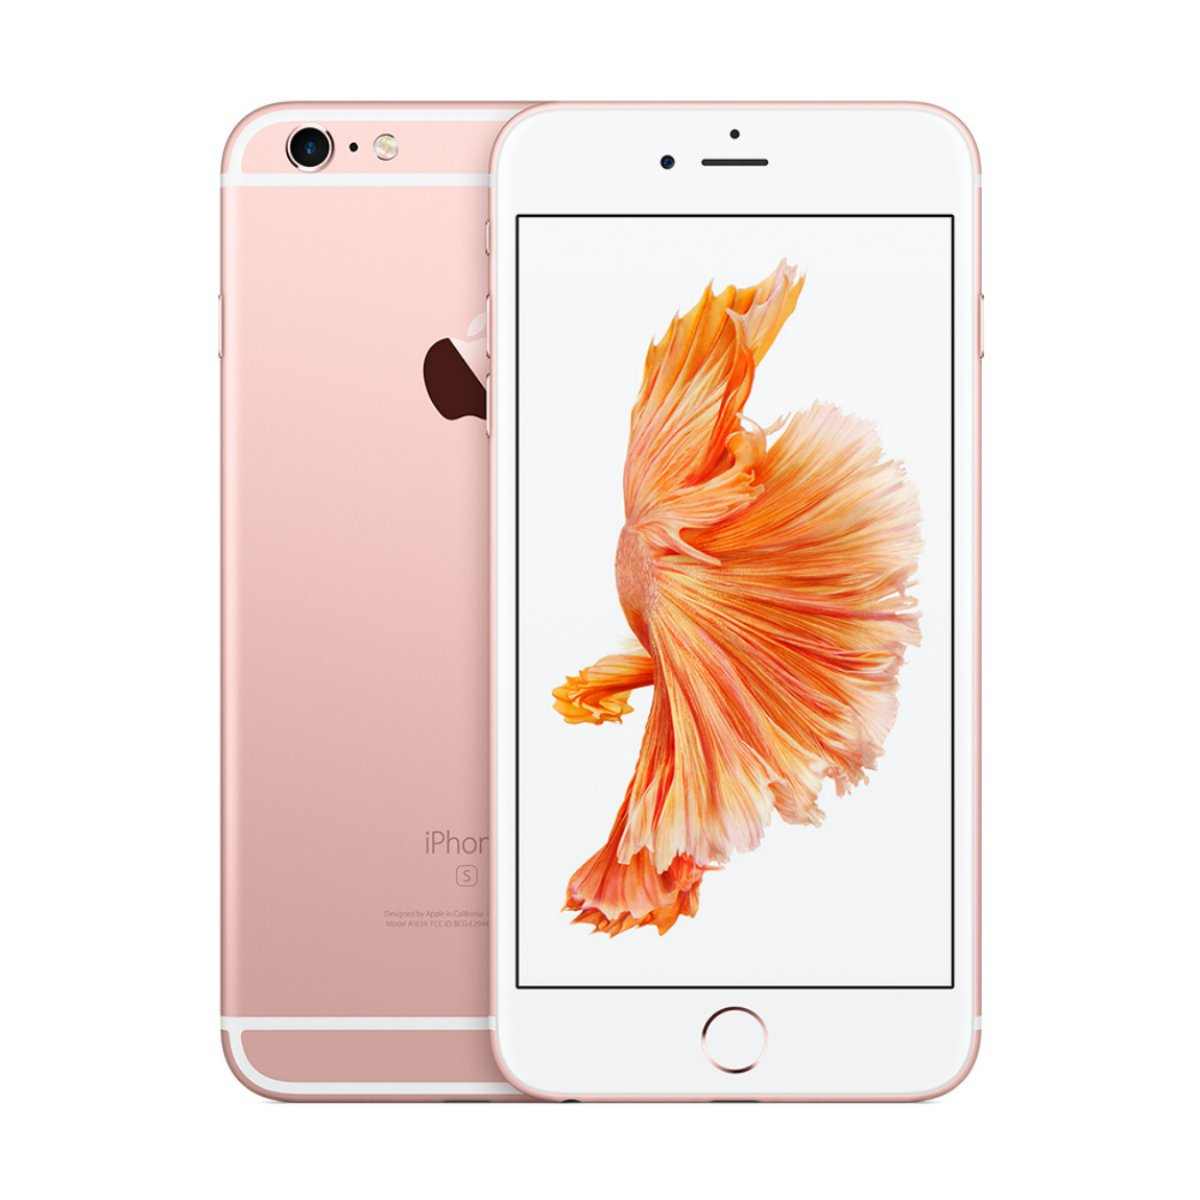 apple iphone 6s plus non facetime rose gold 16gb. Black Bedroom Furniture Sets. Home Design Ideas